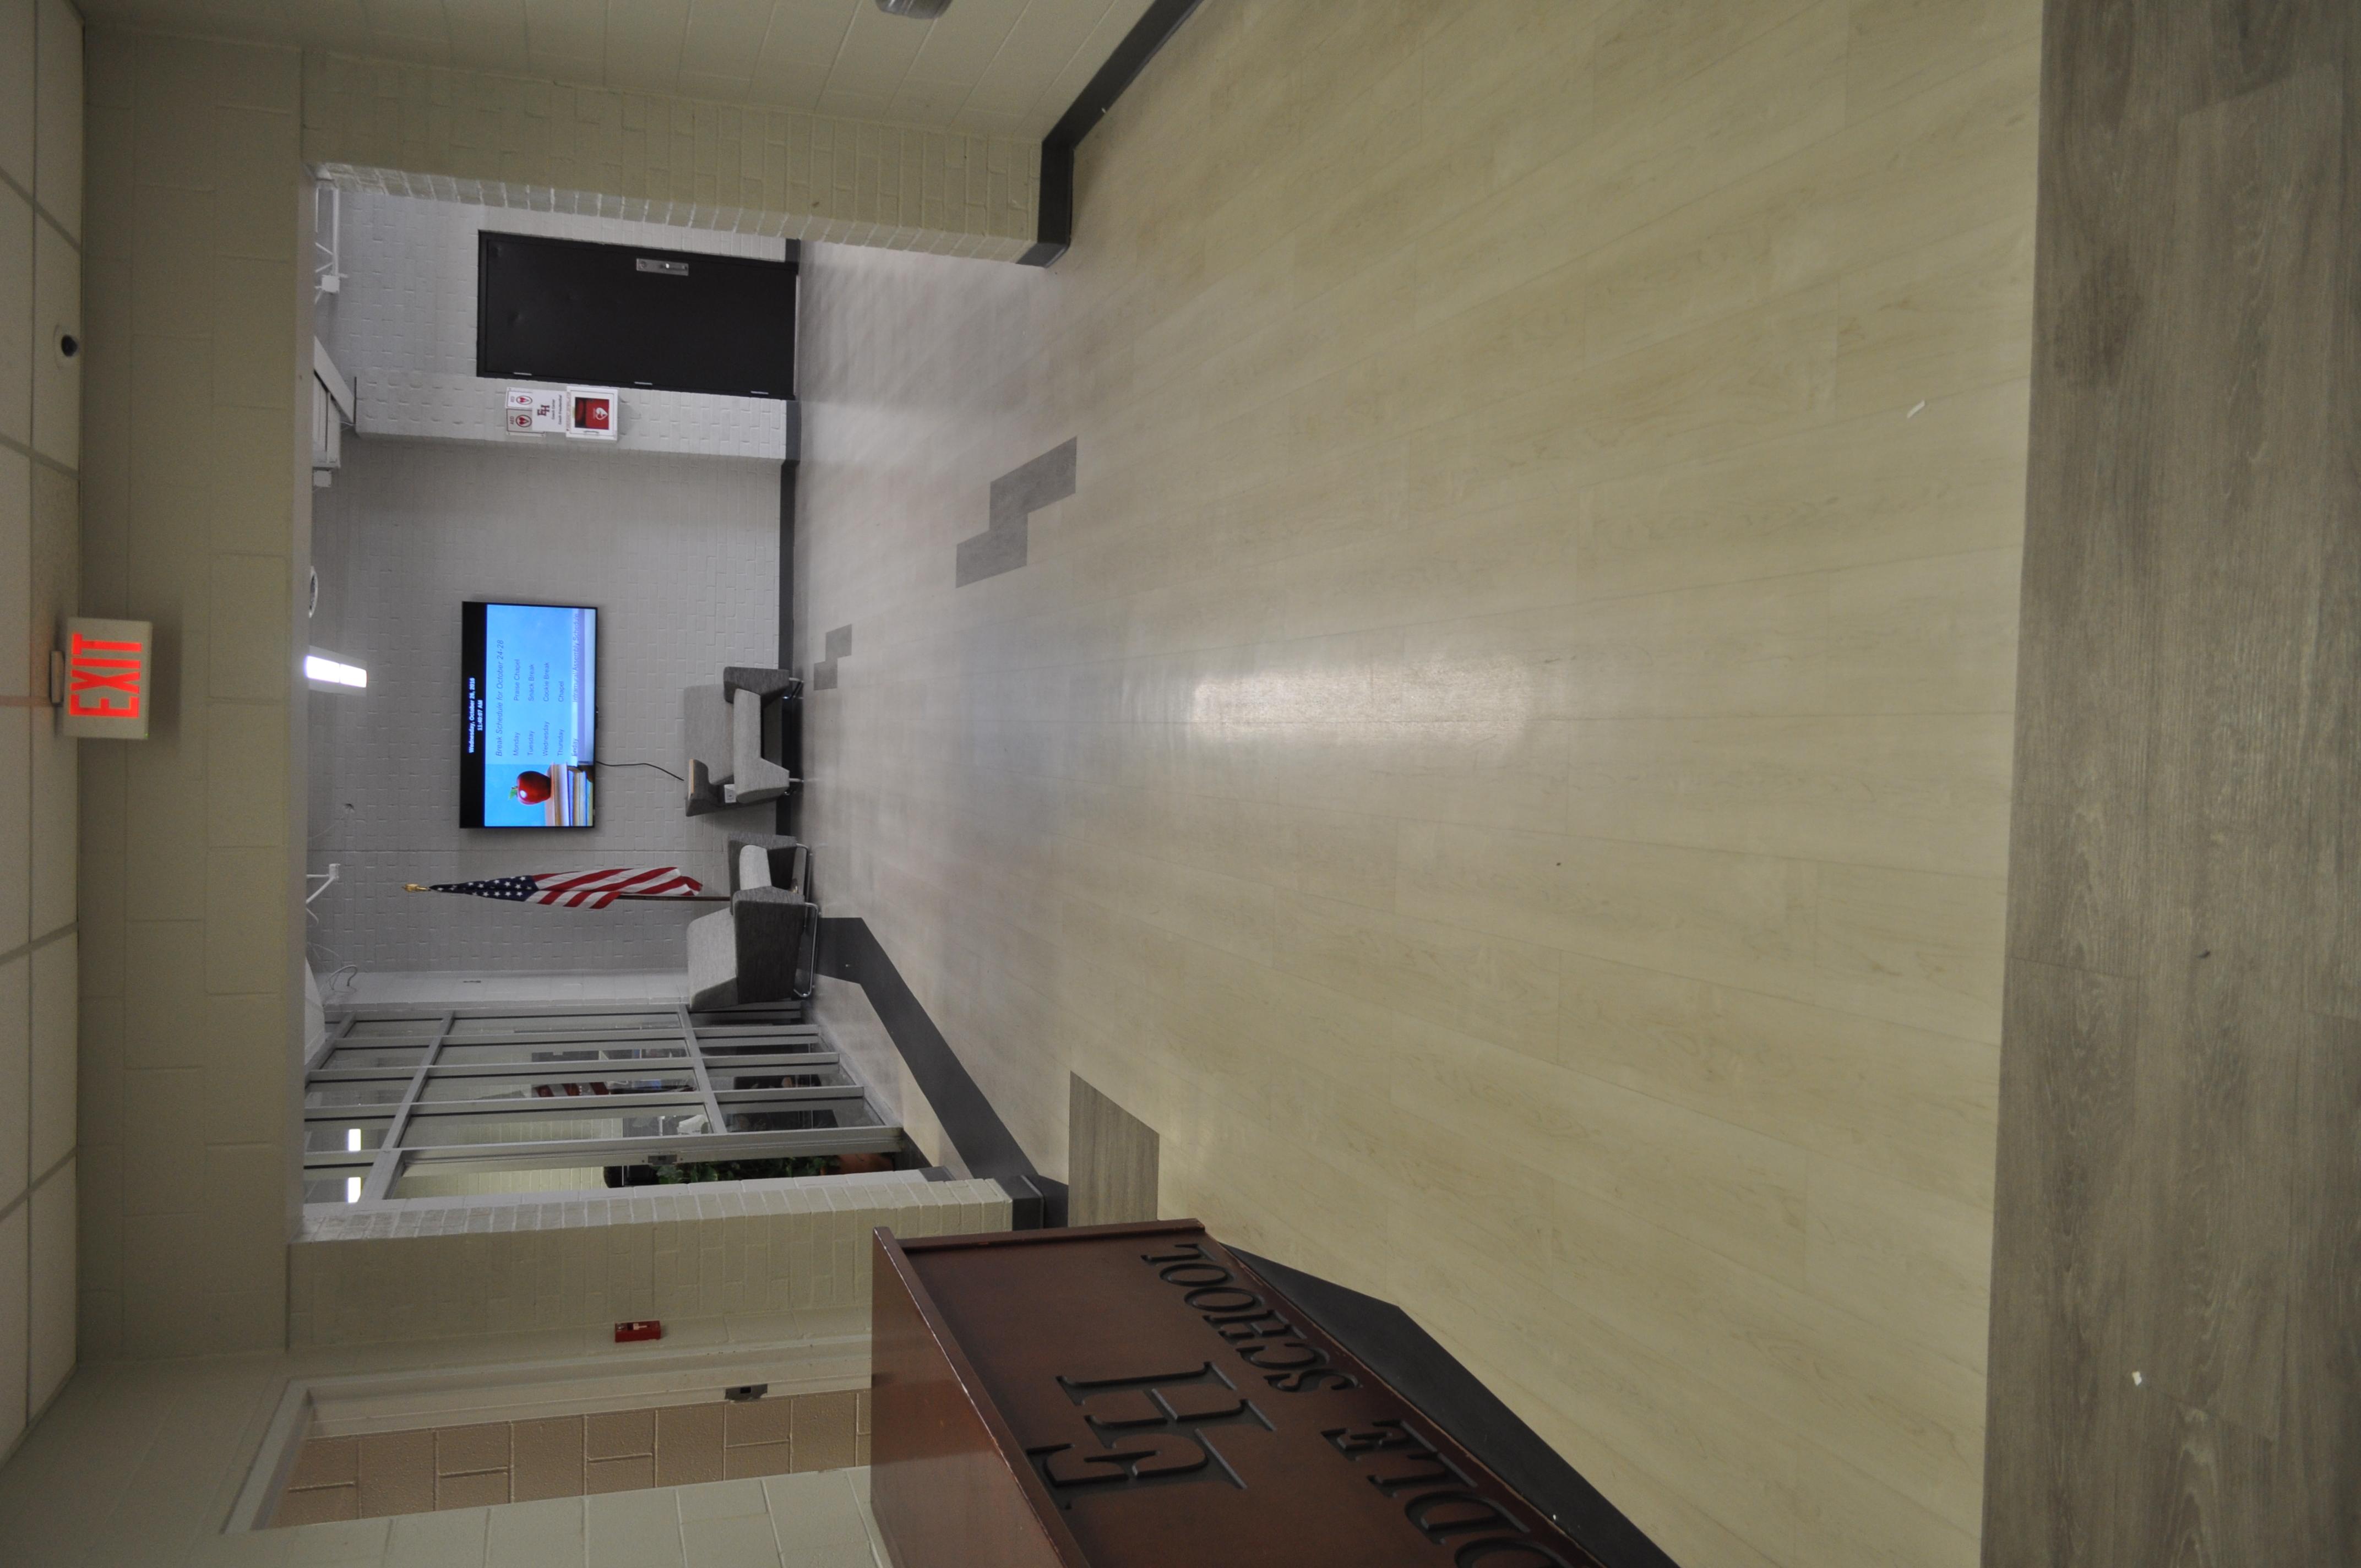 MS - Hallway